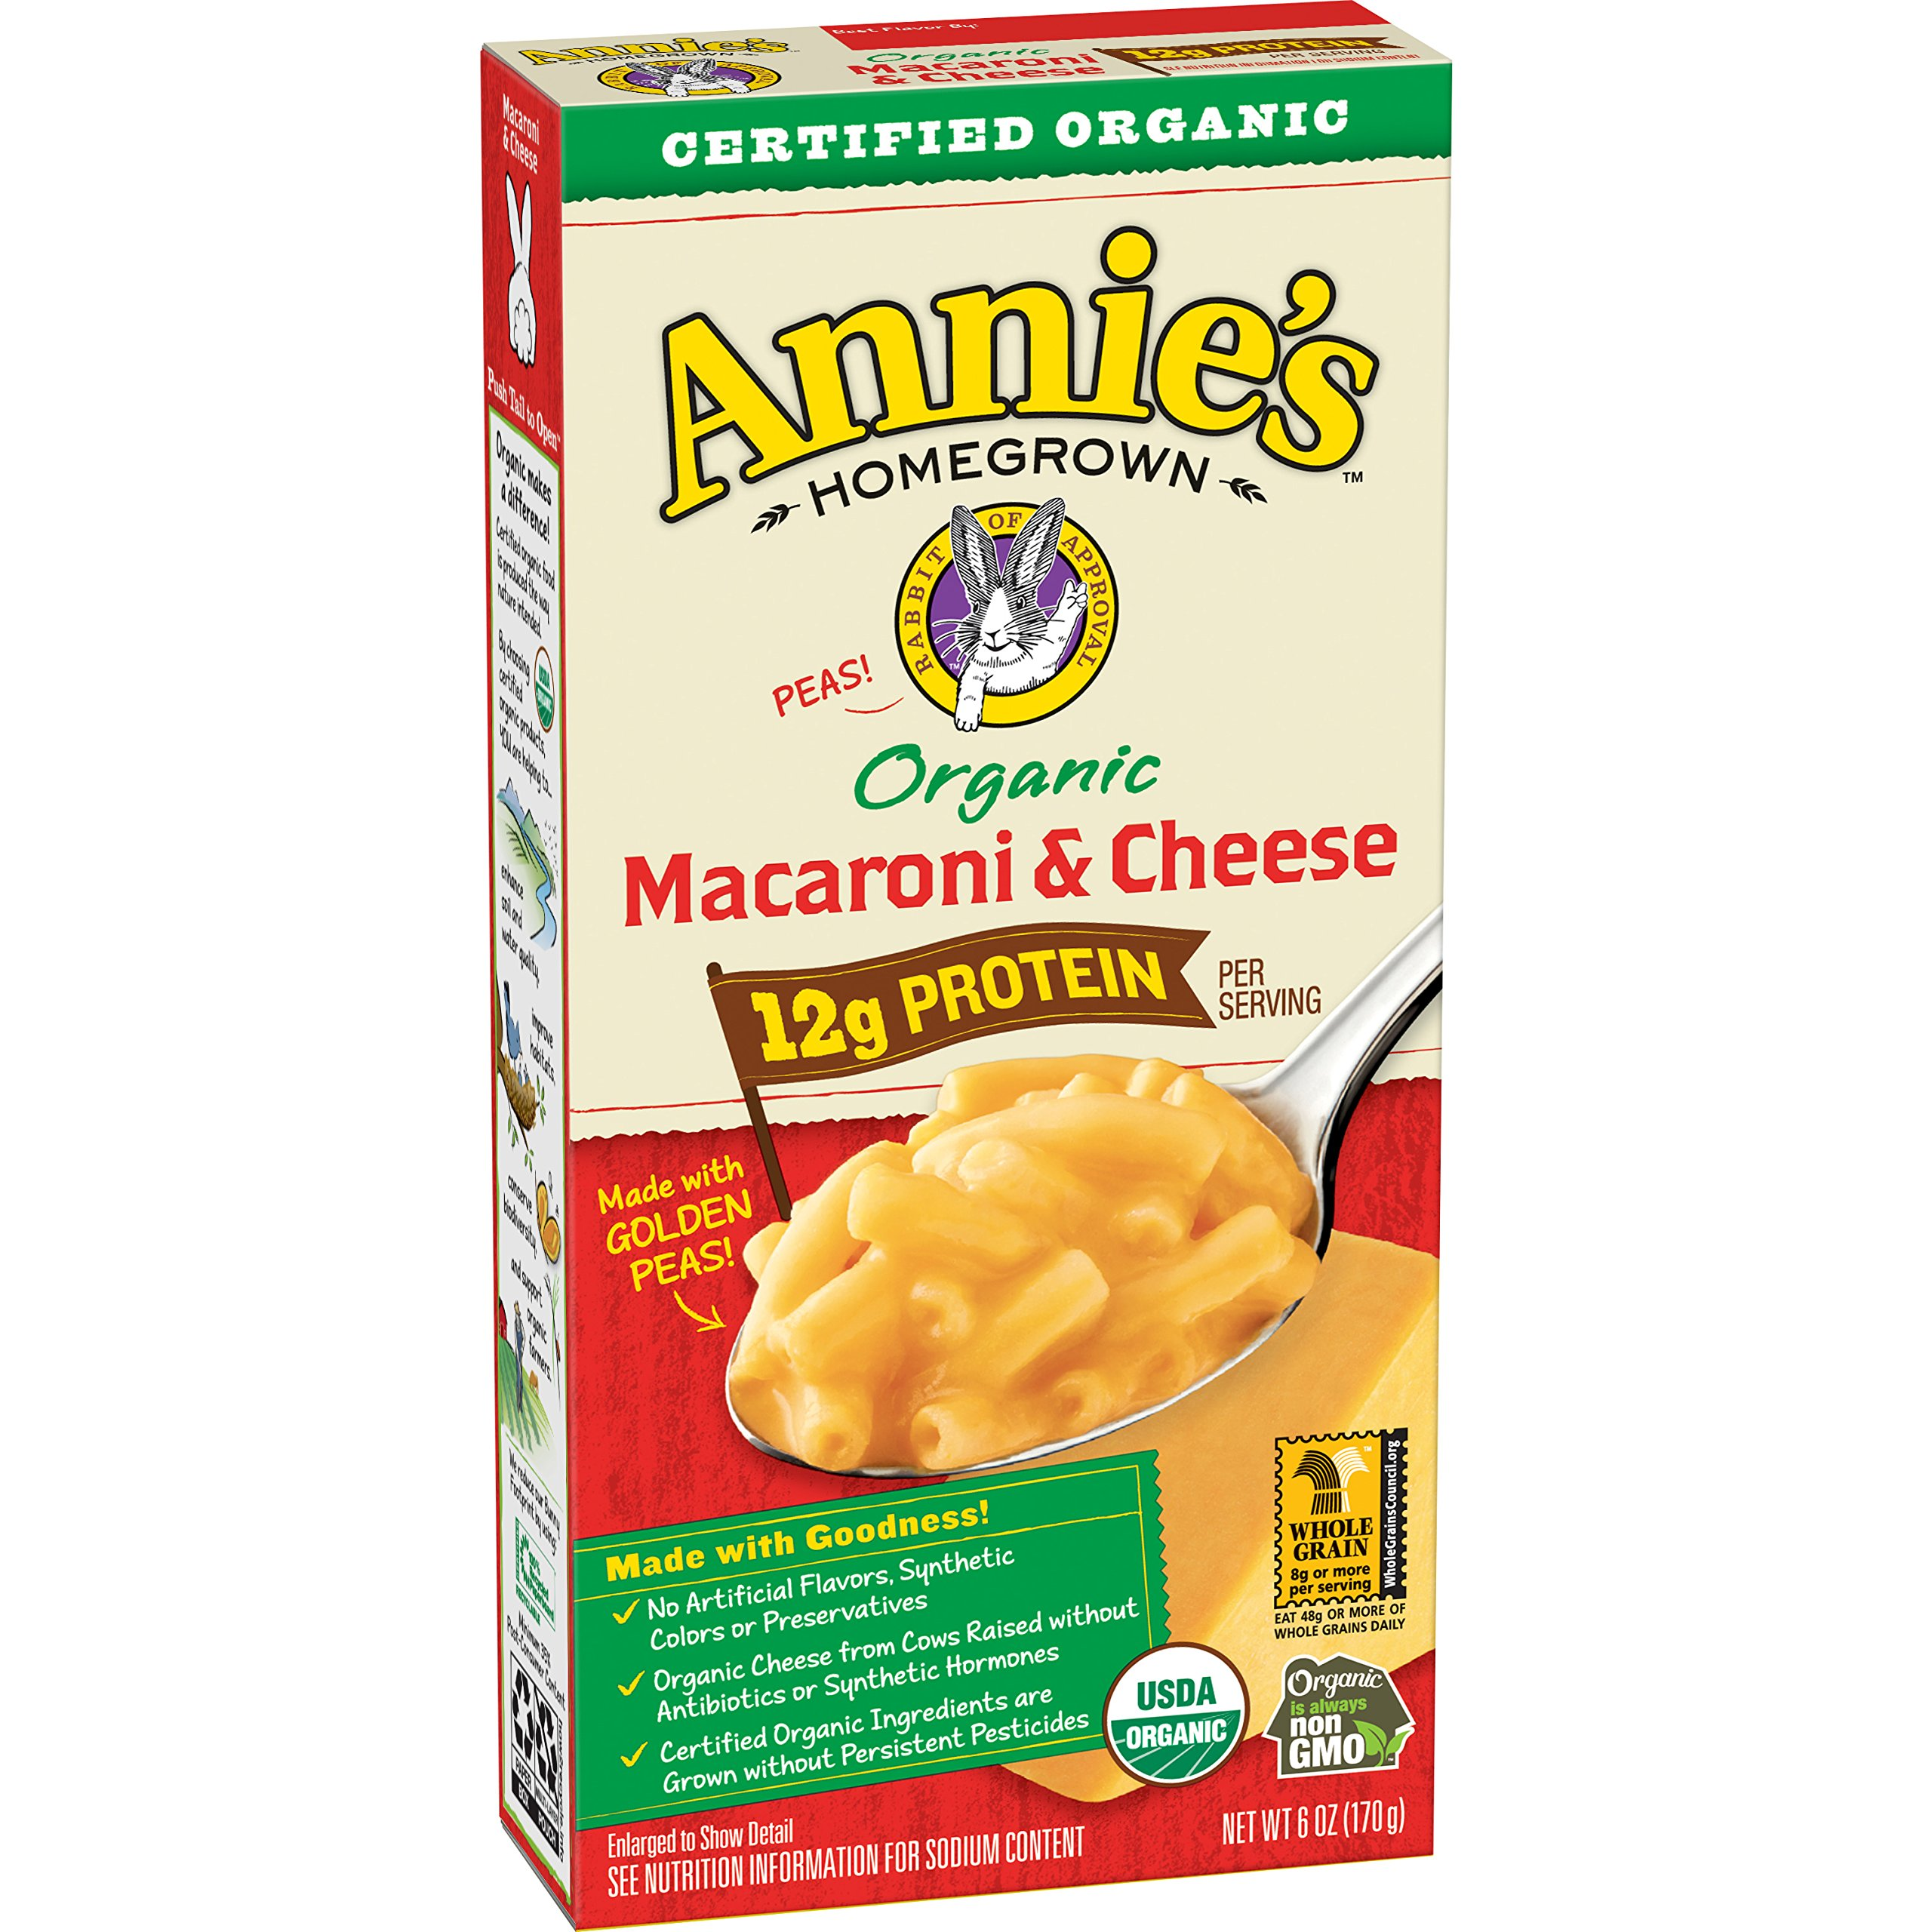 Annie's Organic Macaroni & Cheese Box, 6 Ounce (Pack of 12)